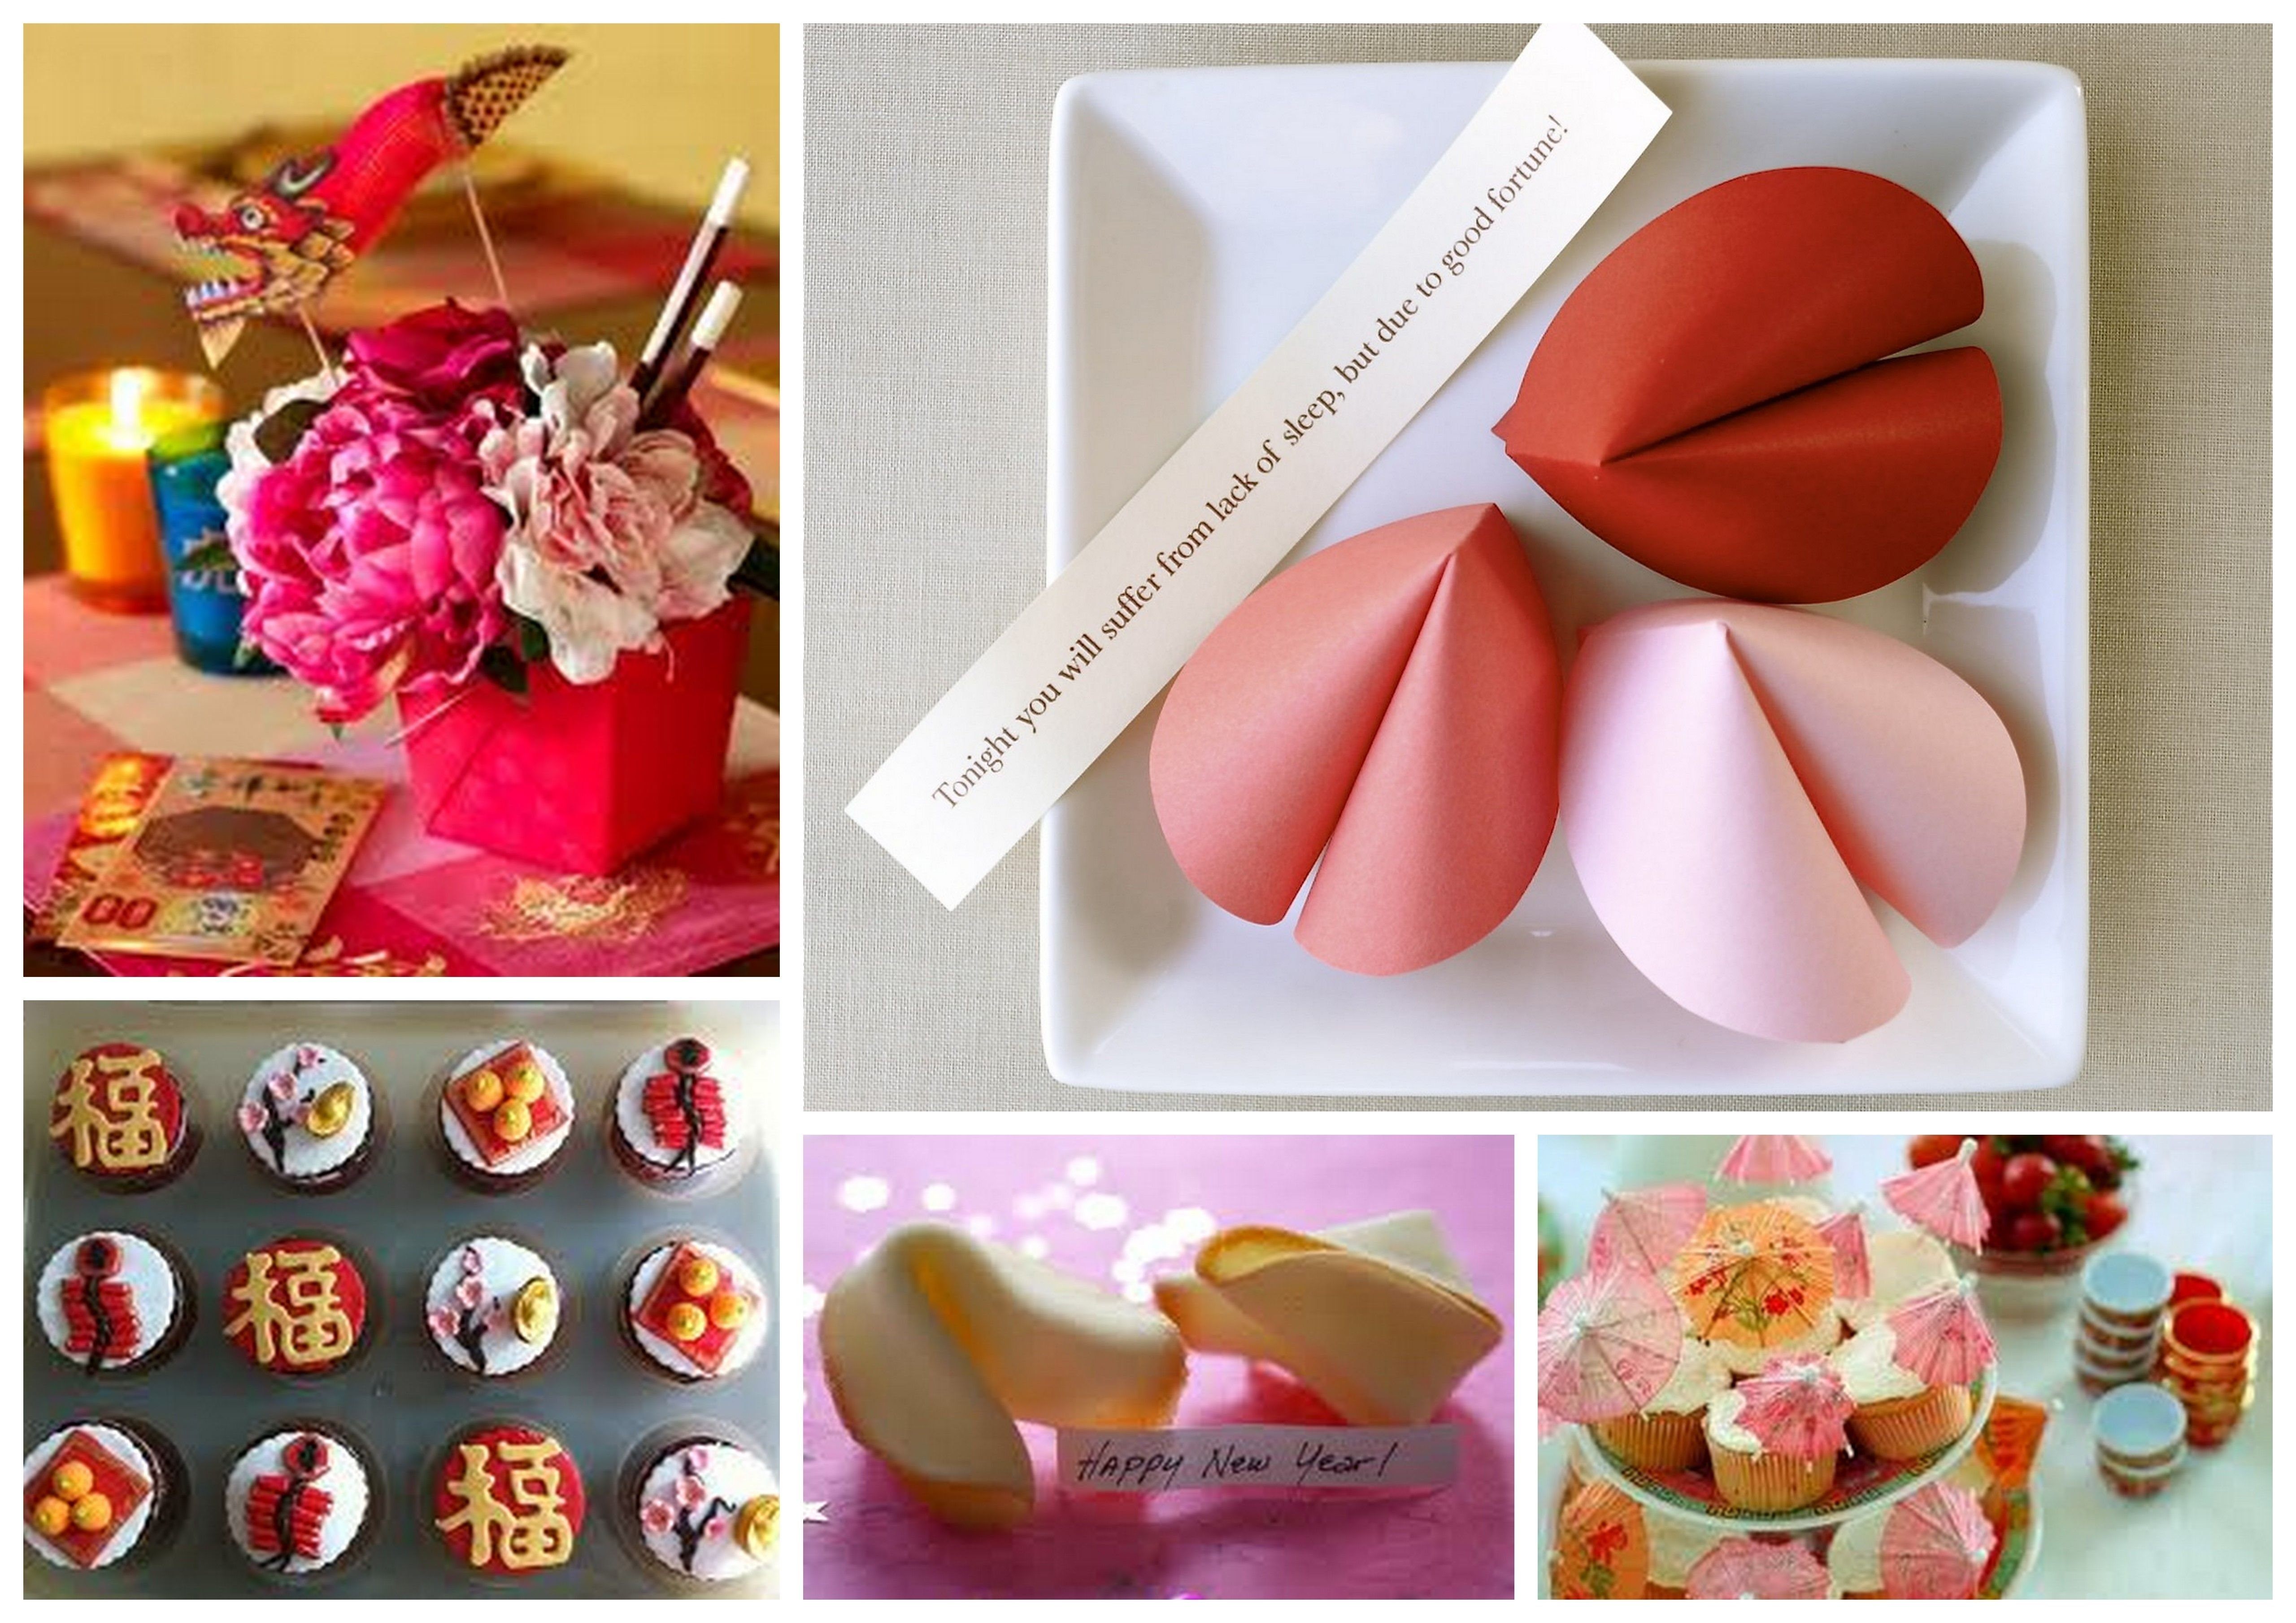 10 Fashionable Chinese New Year Celebration Ideas chinese new year ideas chinese take out party pinterest party 2020